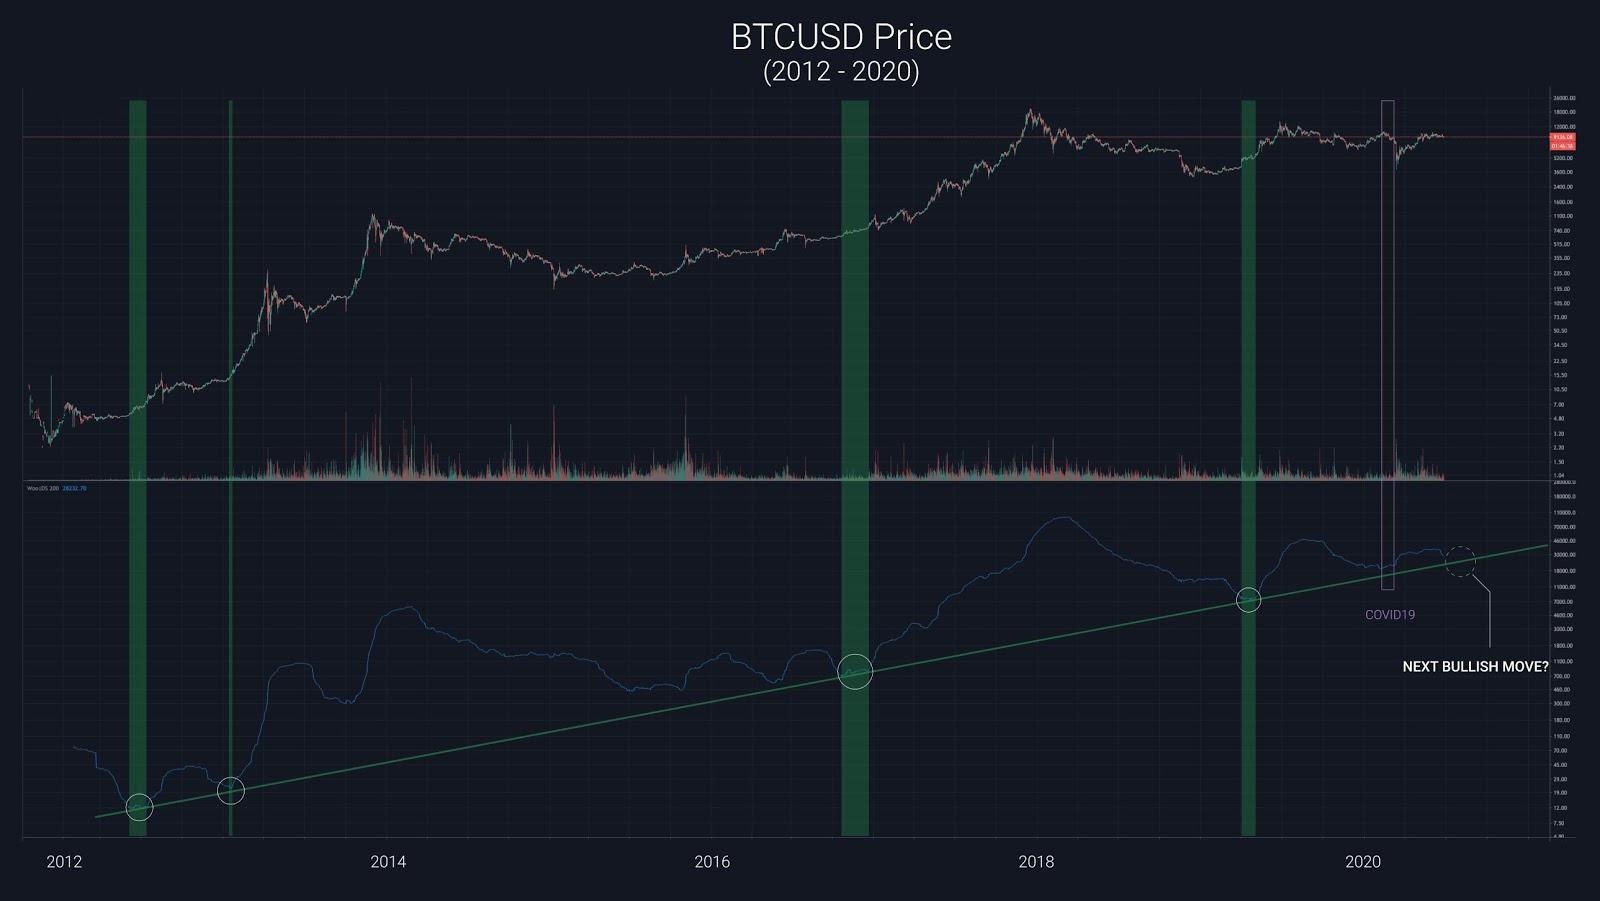 A new Bitcoin price model